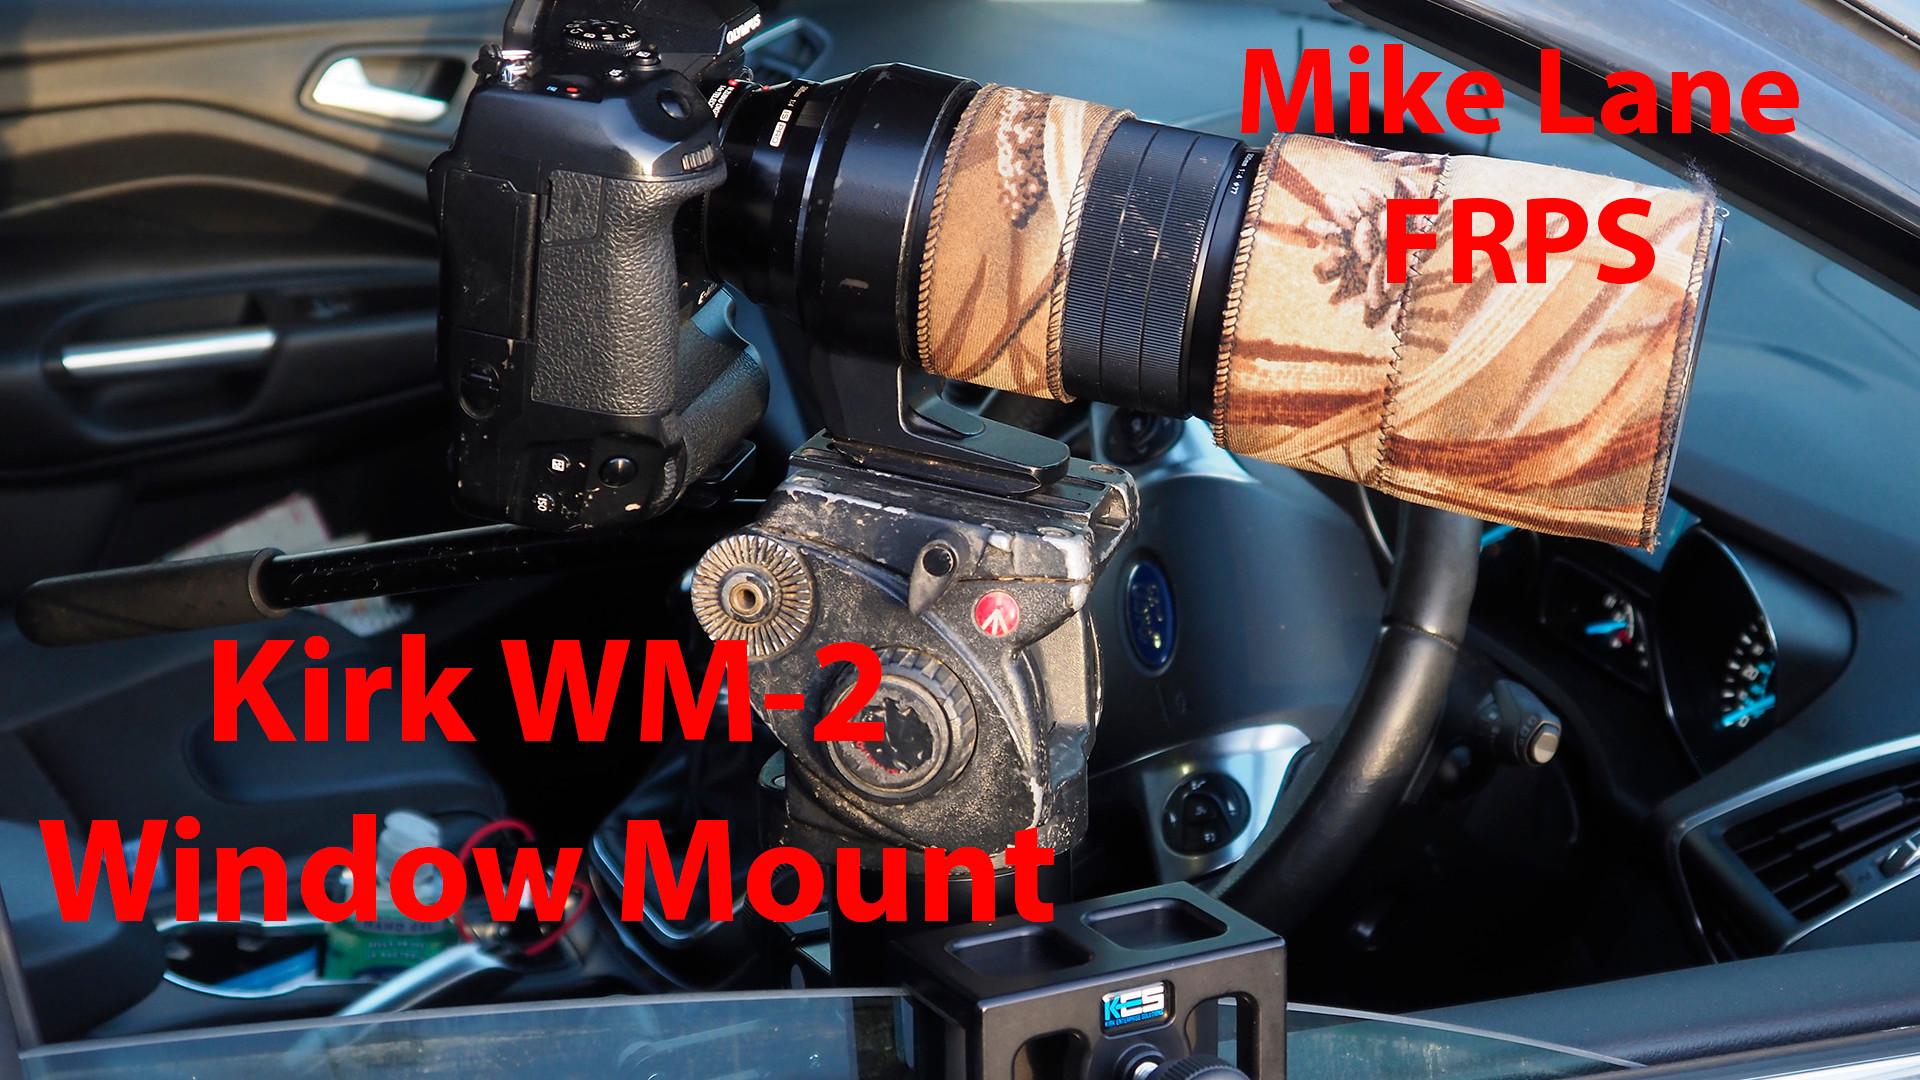 Kirk WM-2 Window Mount